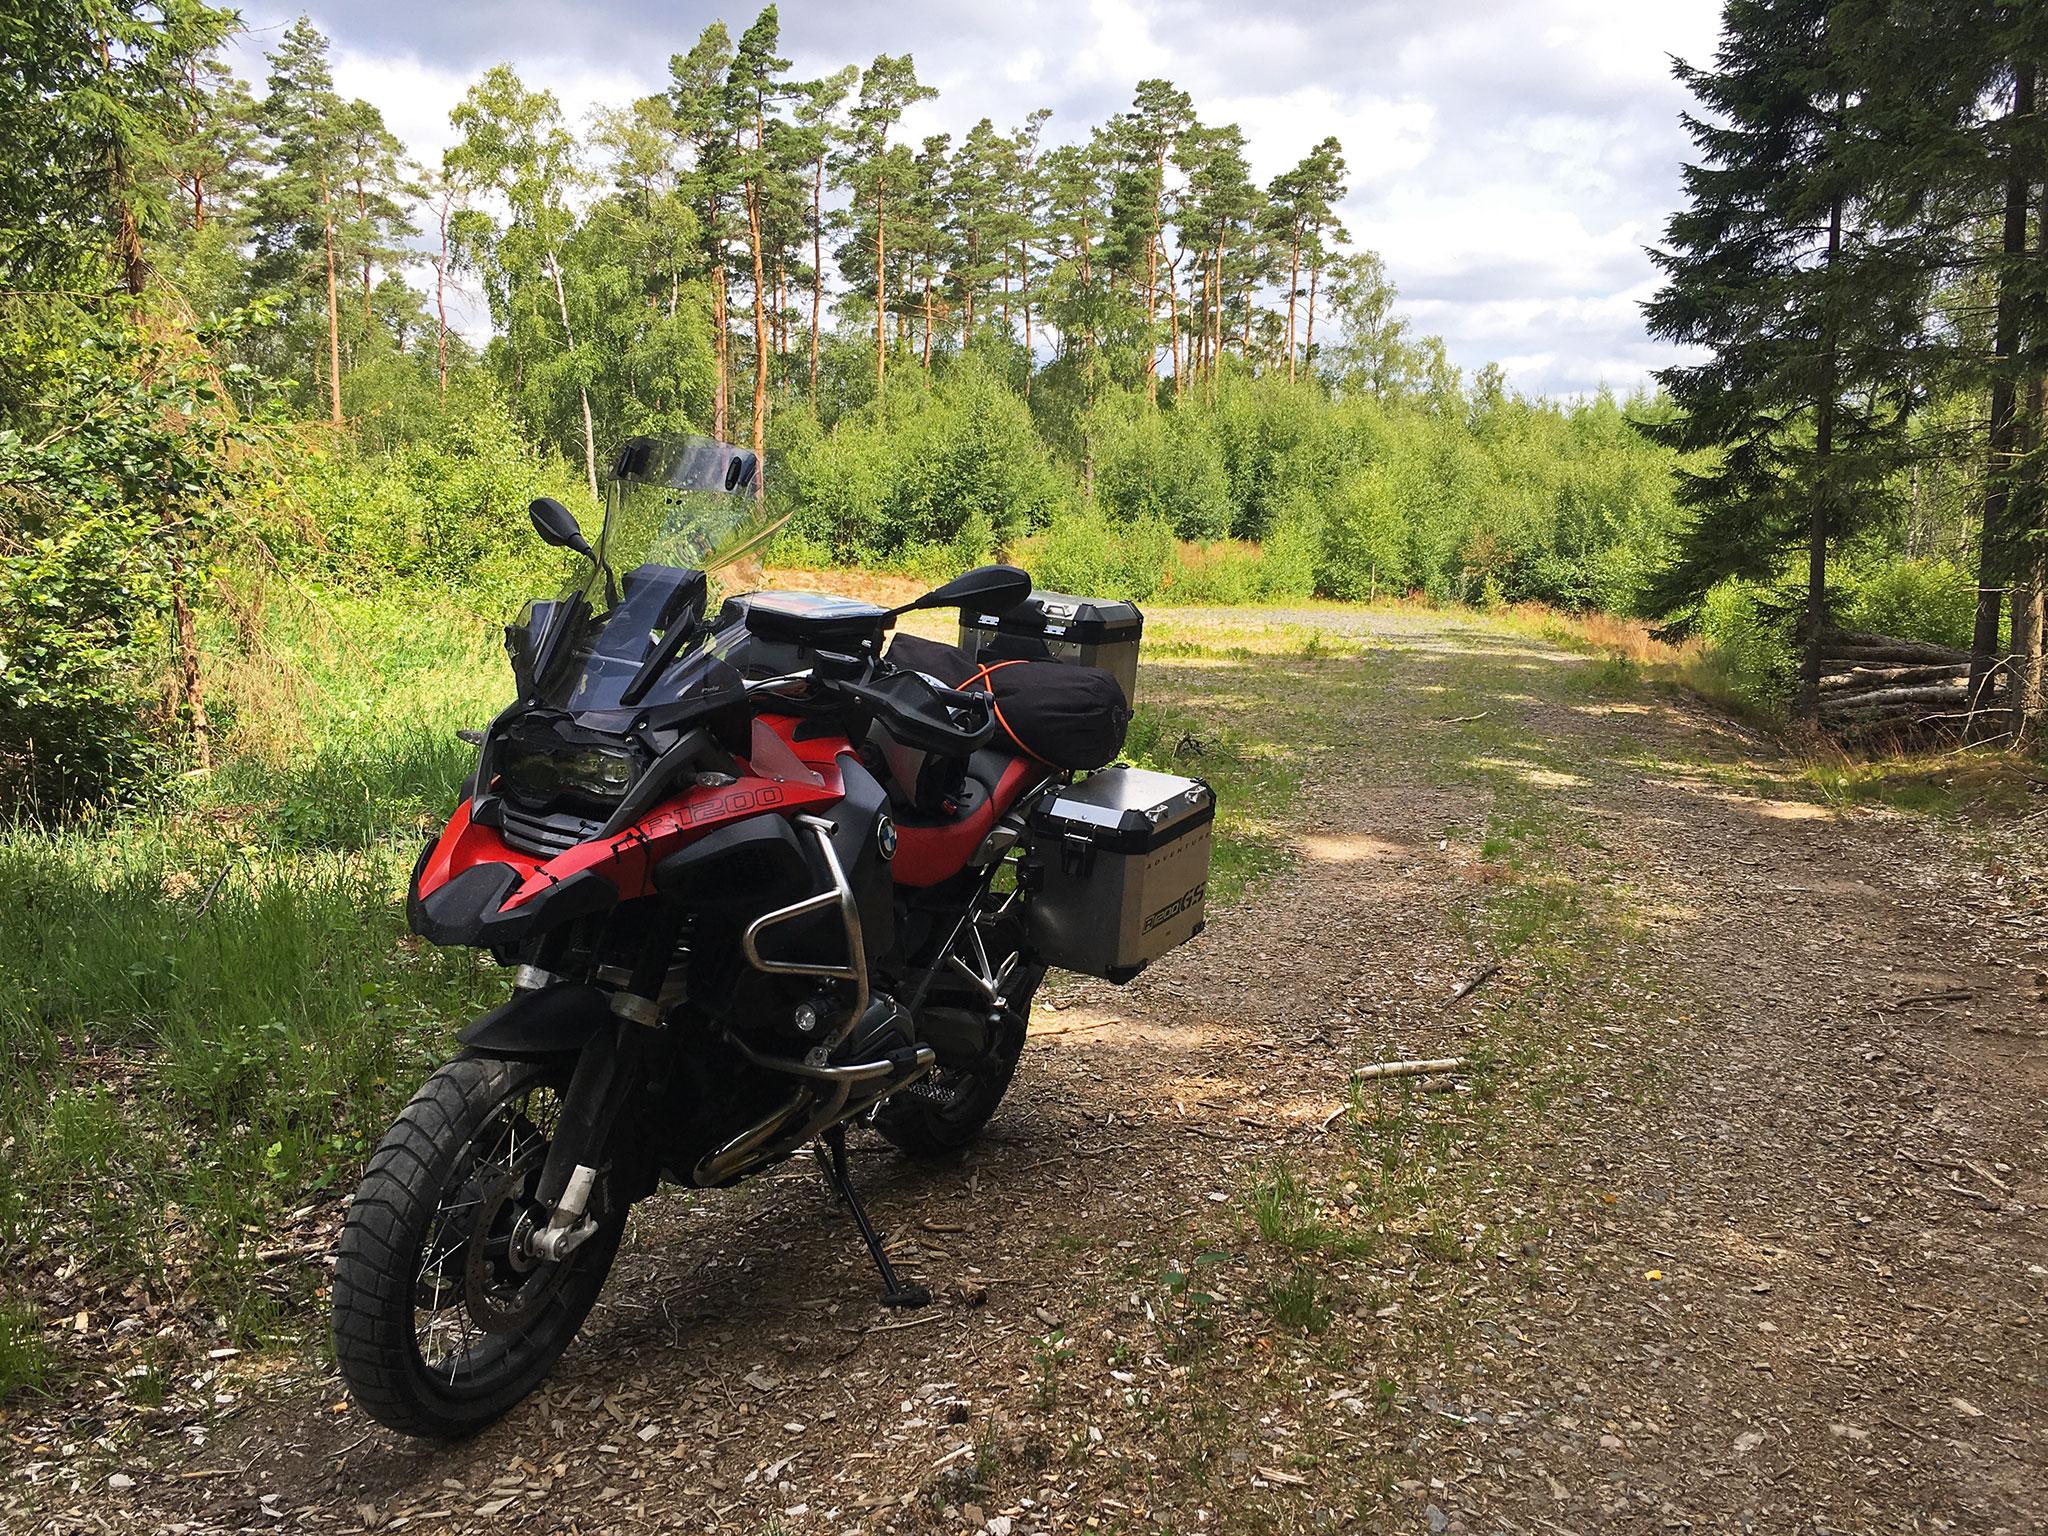 Good to be back on Swedish gravel & dirt roads